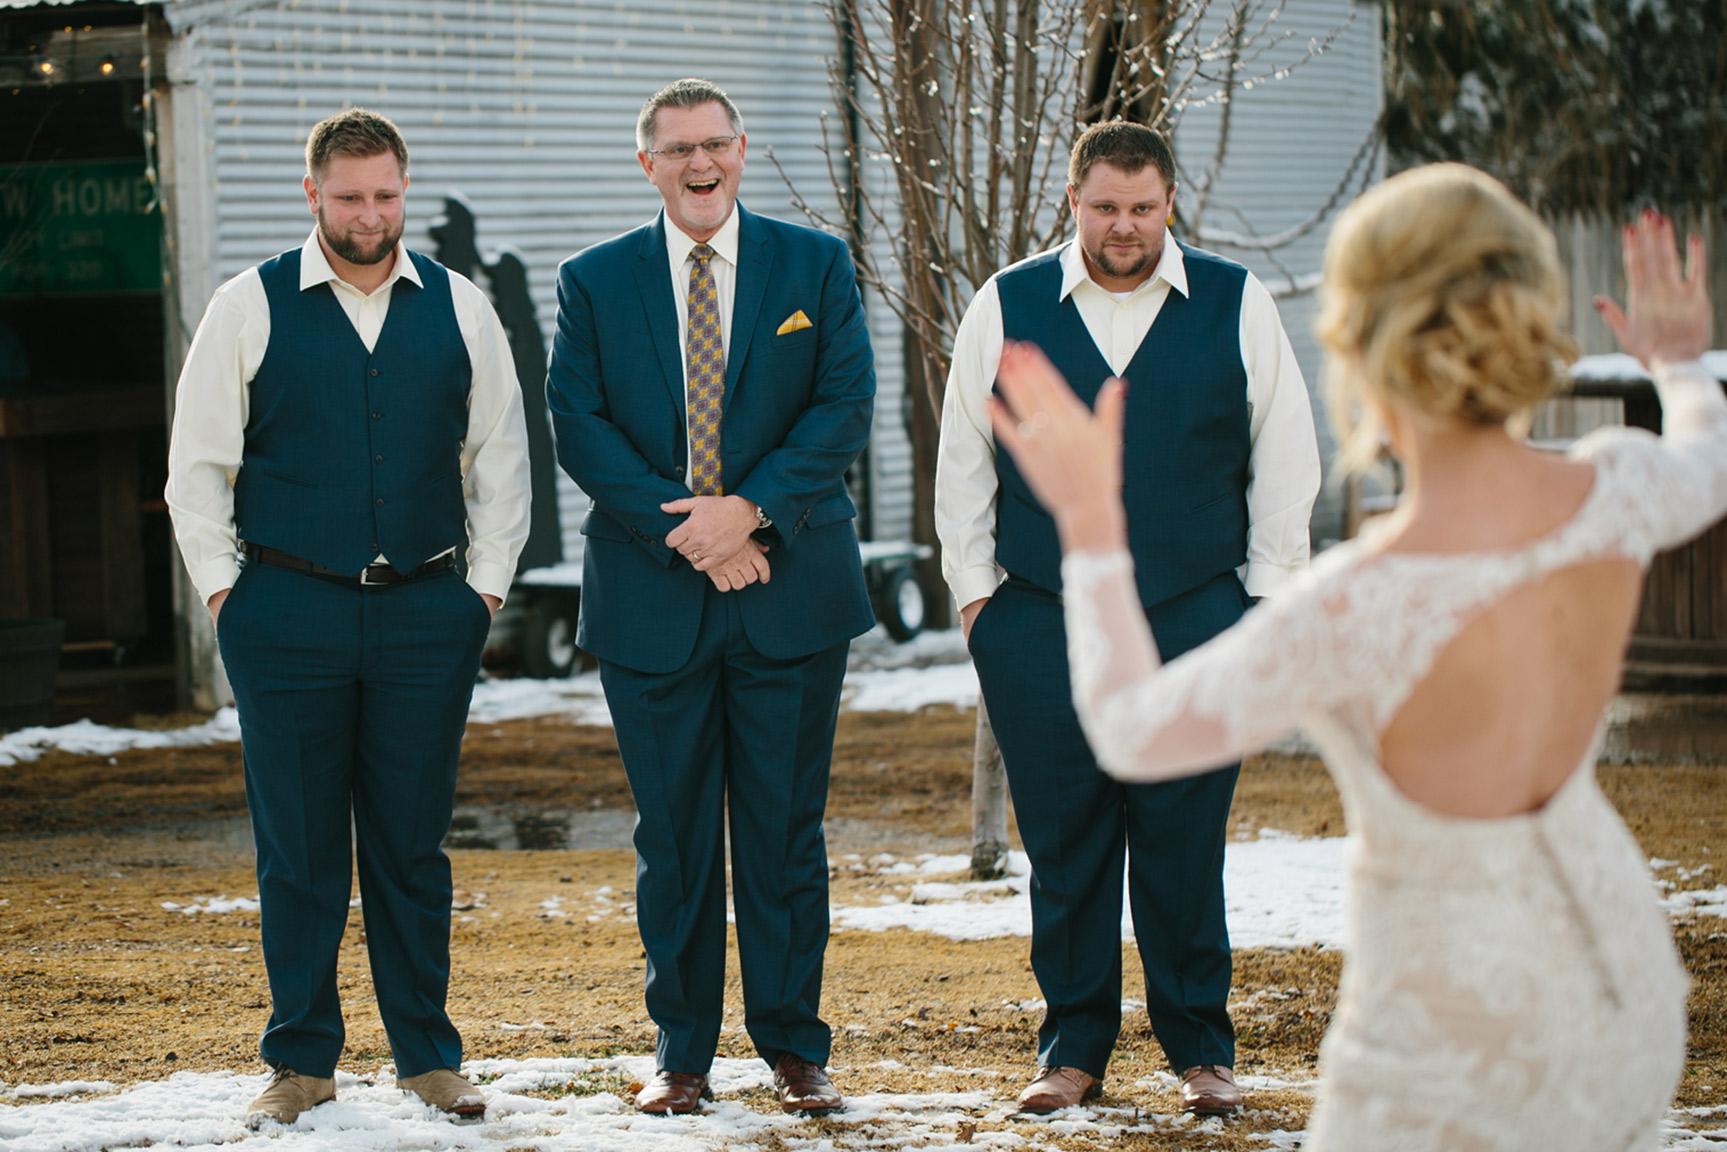 Cotton_Creek_Barn_Winter_Wedding_WeddingPhotographer033.jpg